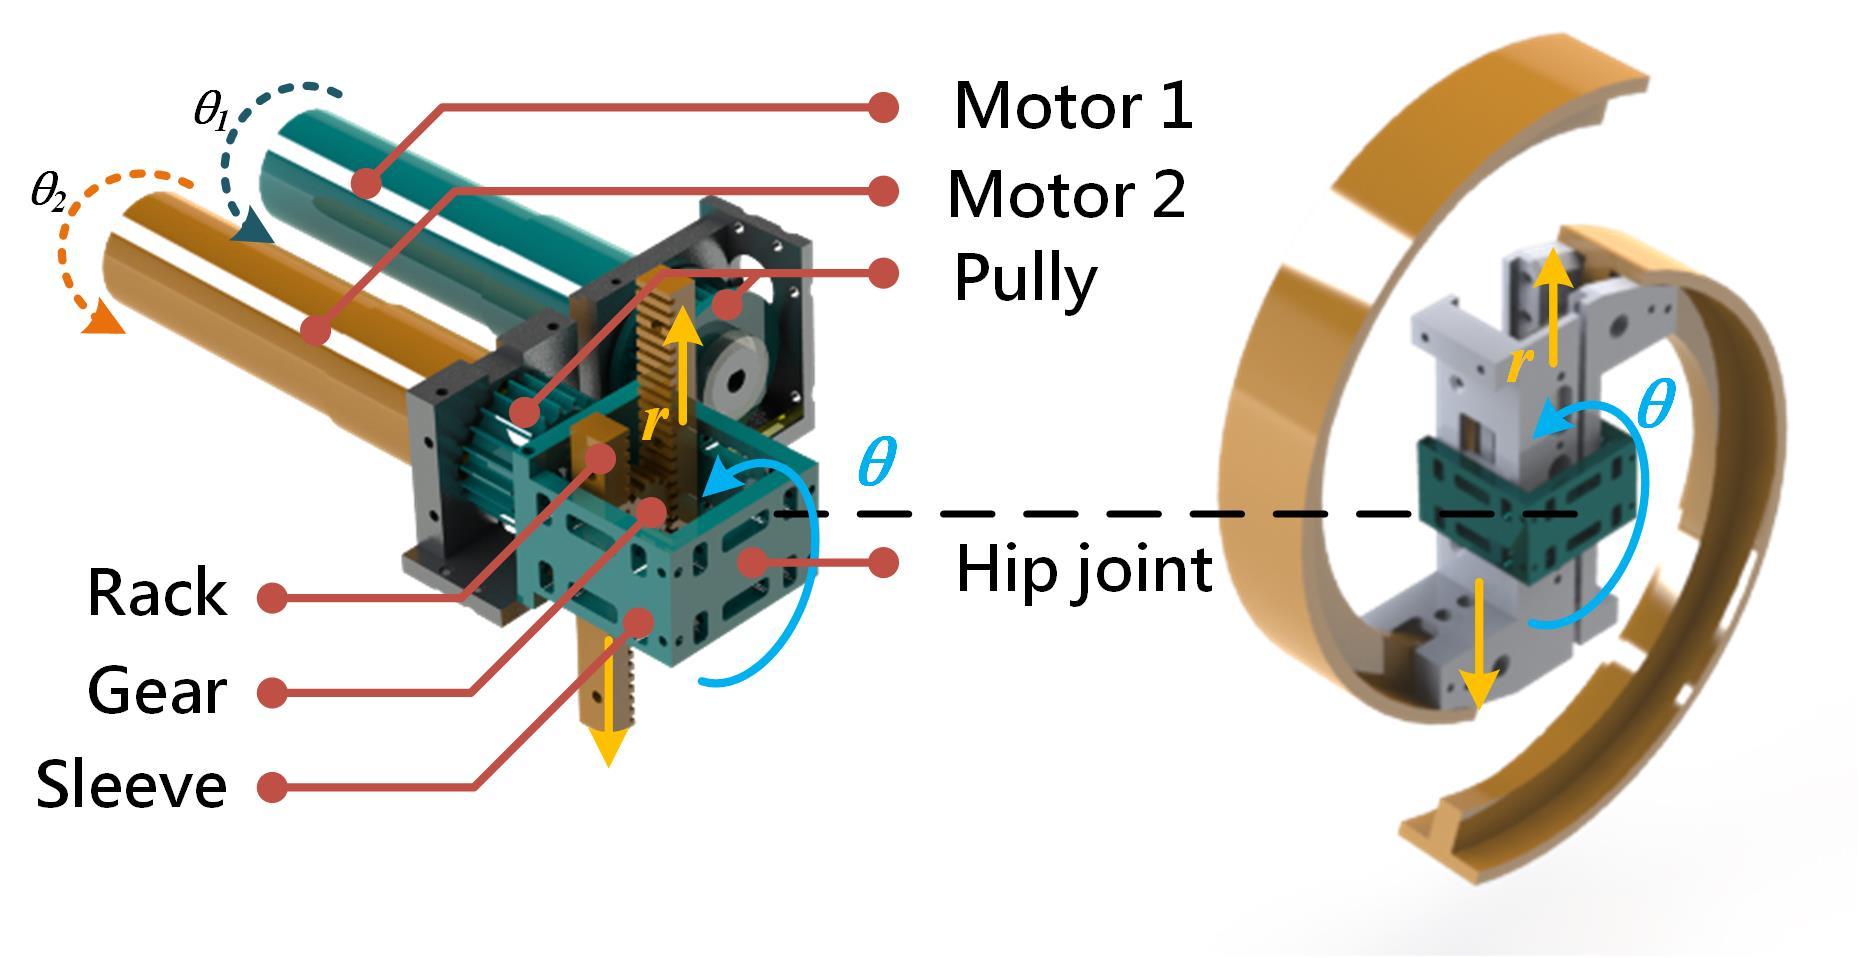 A leg-wheel transformable mobile platform